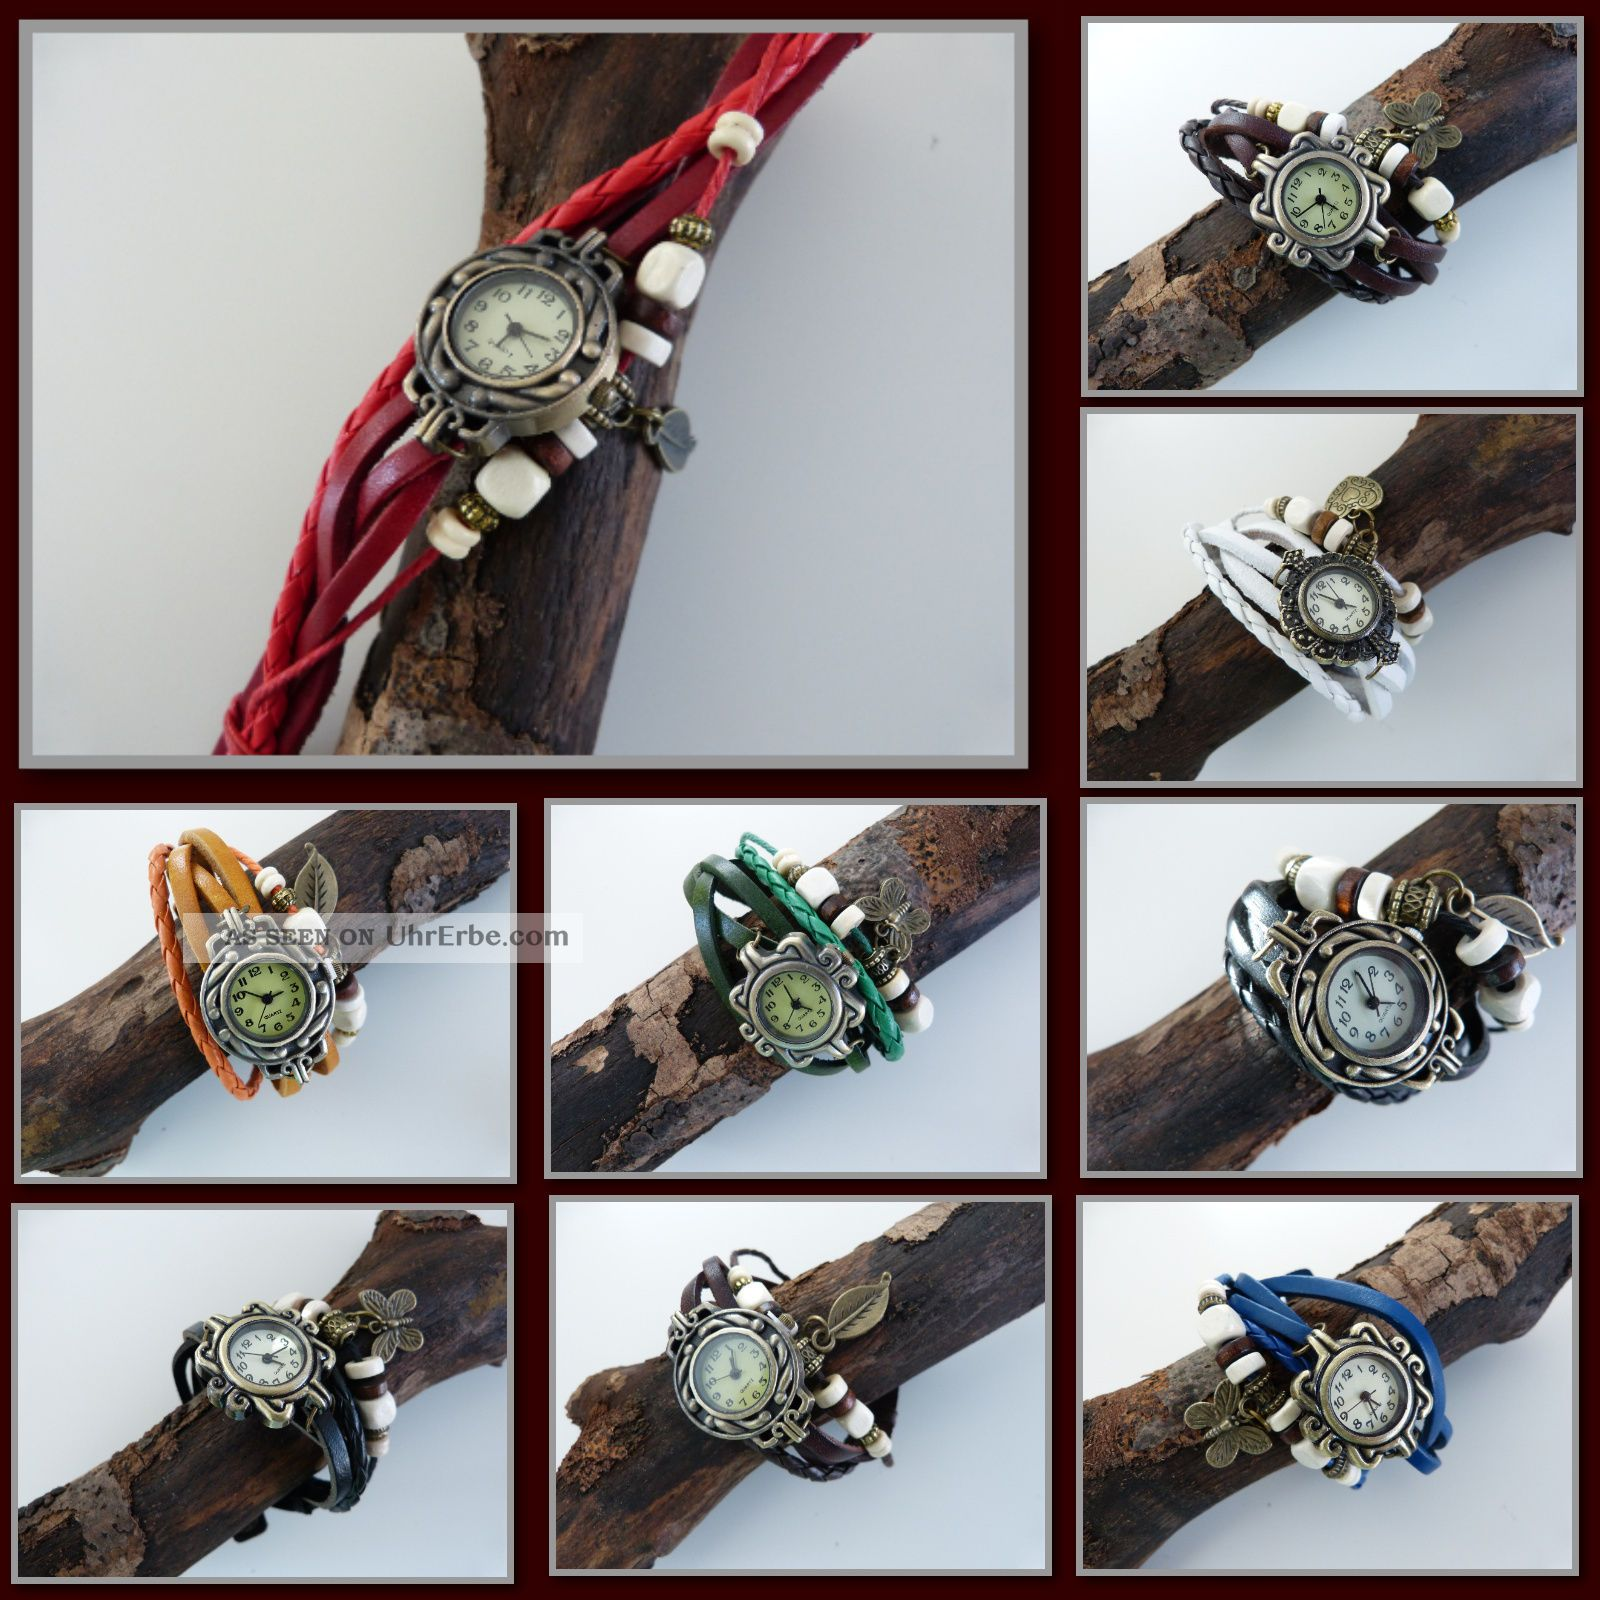 Wickeluhr Damenarmbanduhr Vintage Uhr Armbanduhr Damenuhr Lederarmband Armbanduhren Bild